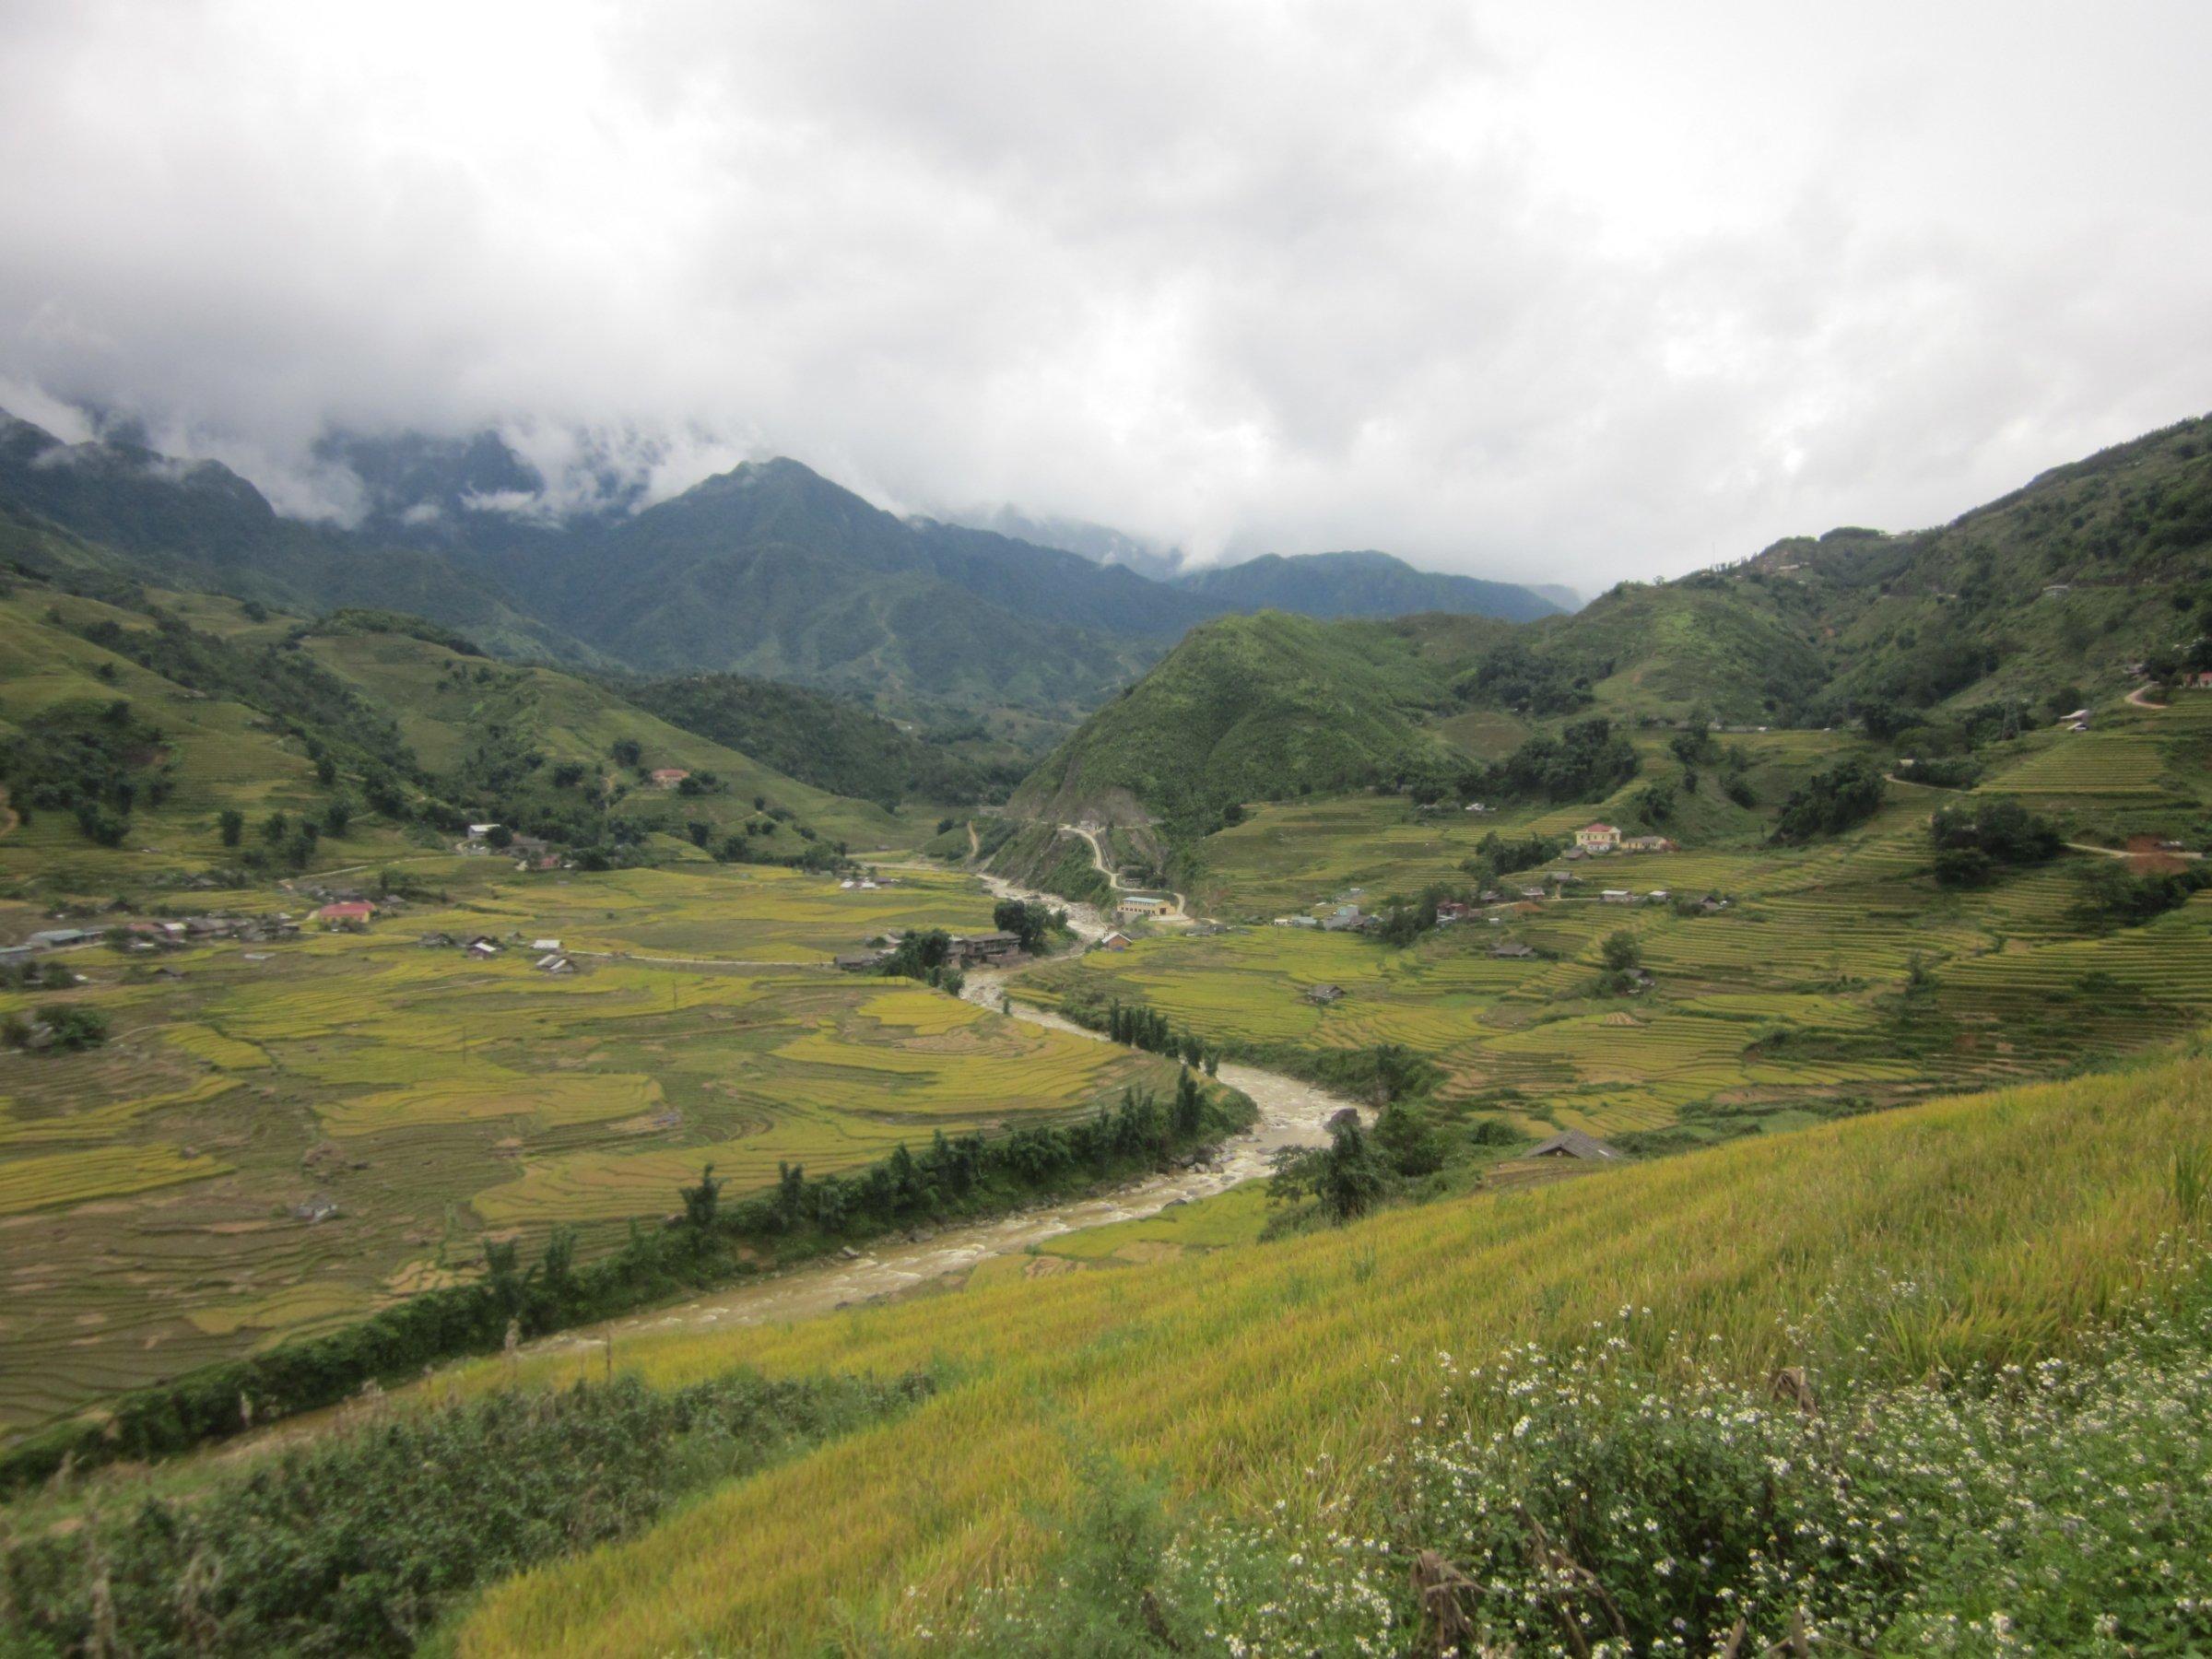 8-Day Vietnam's Northern Highlights - Vietnam Itinerary